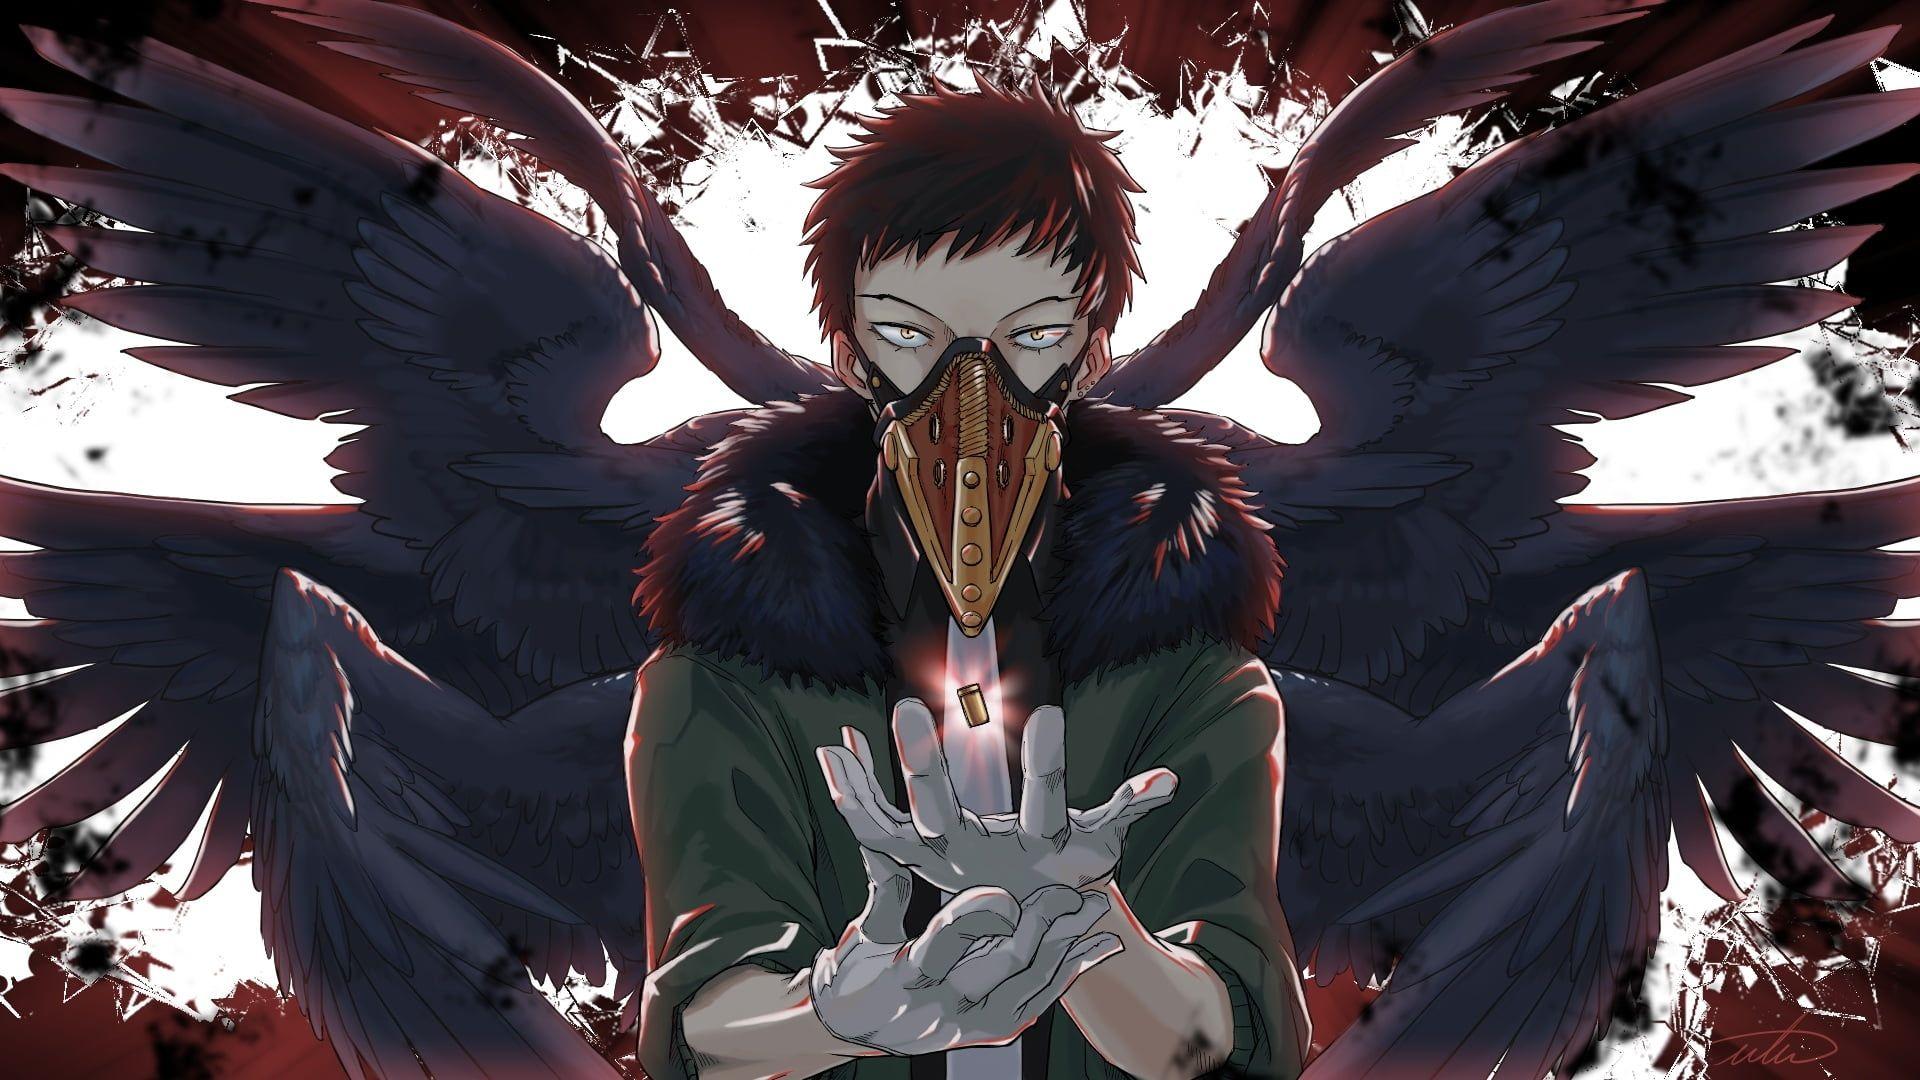 Kai Chisaki Overhaul My Hero Acadamia Boku No Hero Academia 1080p Wallpaper Hdwallpaper Desktop Boku No Hero Academia Anime My Hero